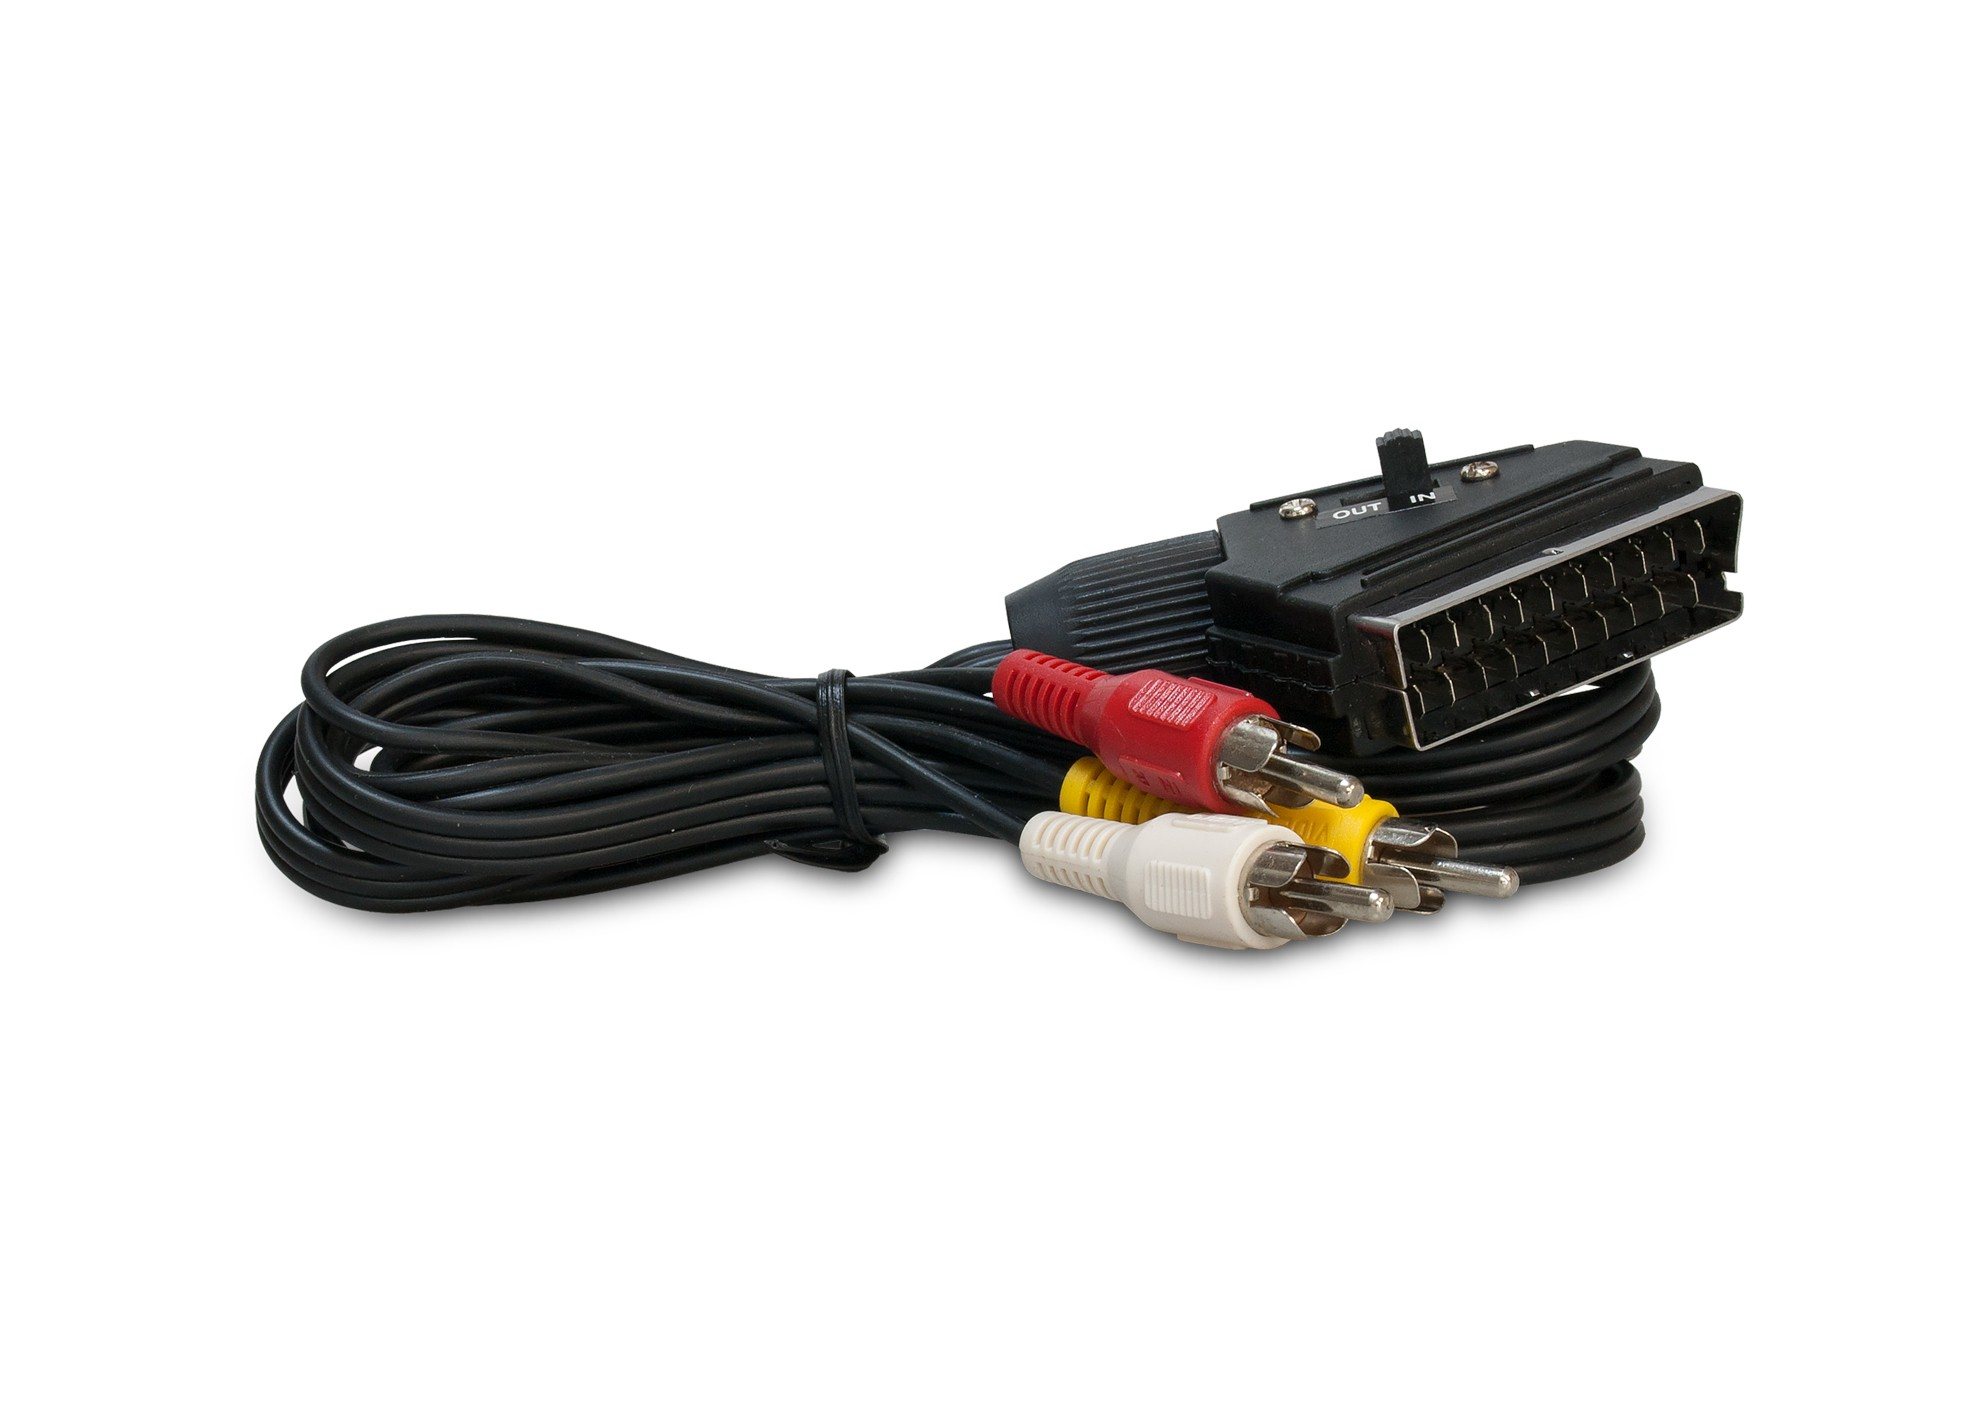 Kábel Scart-3xCinch s prepínačom